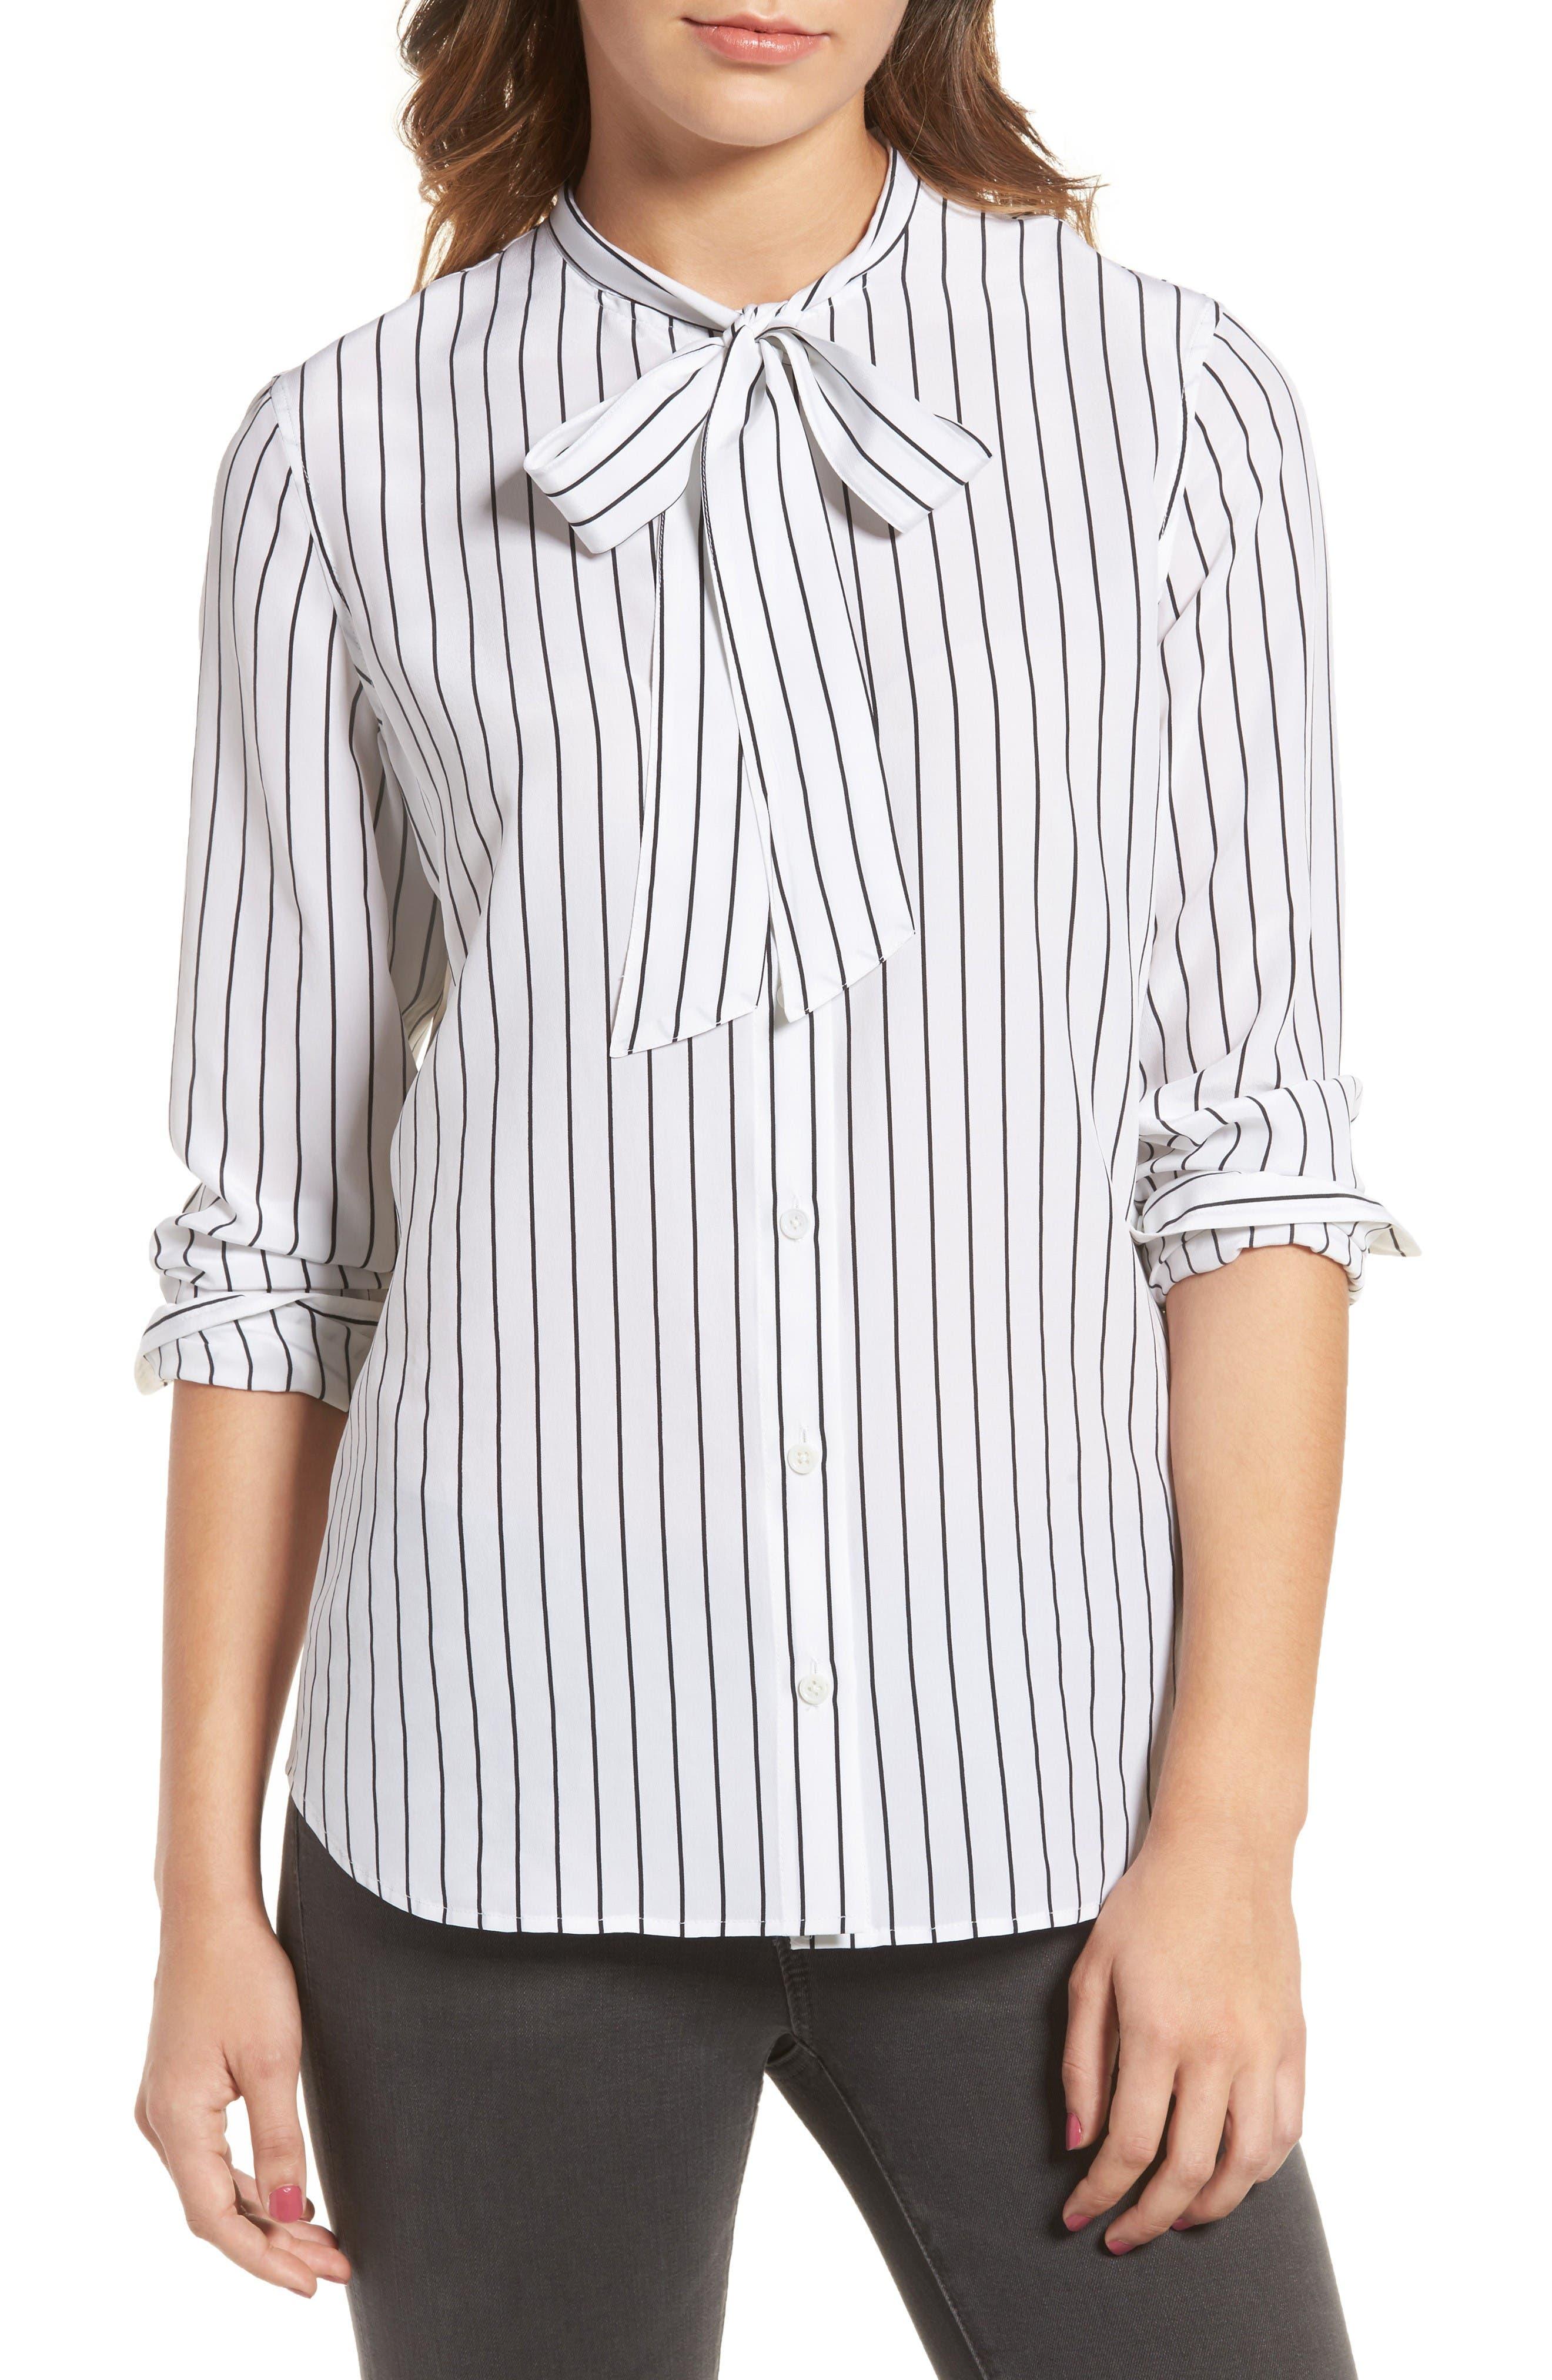 Claire Stripe Silk Shirt,                         Main,                         color, True White / True Black Stripe